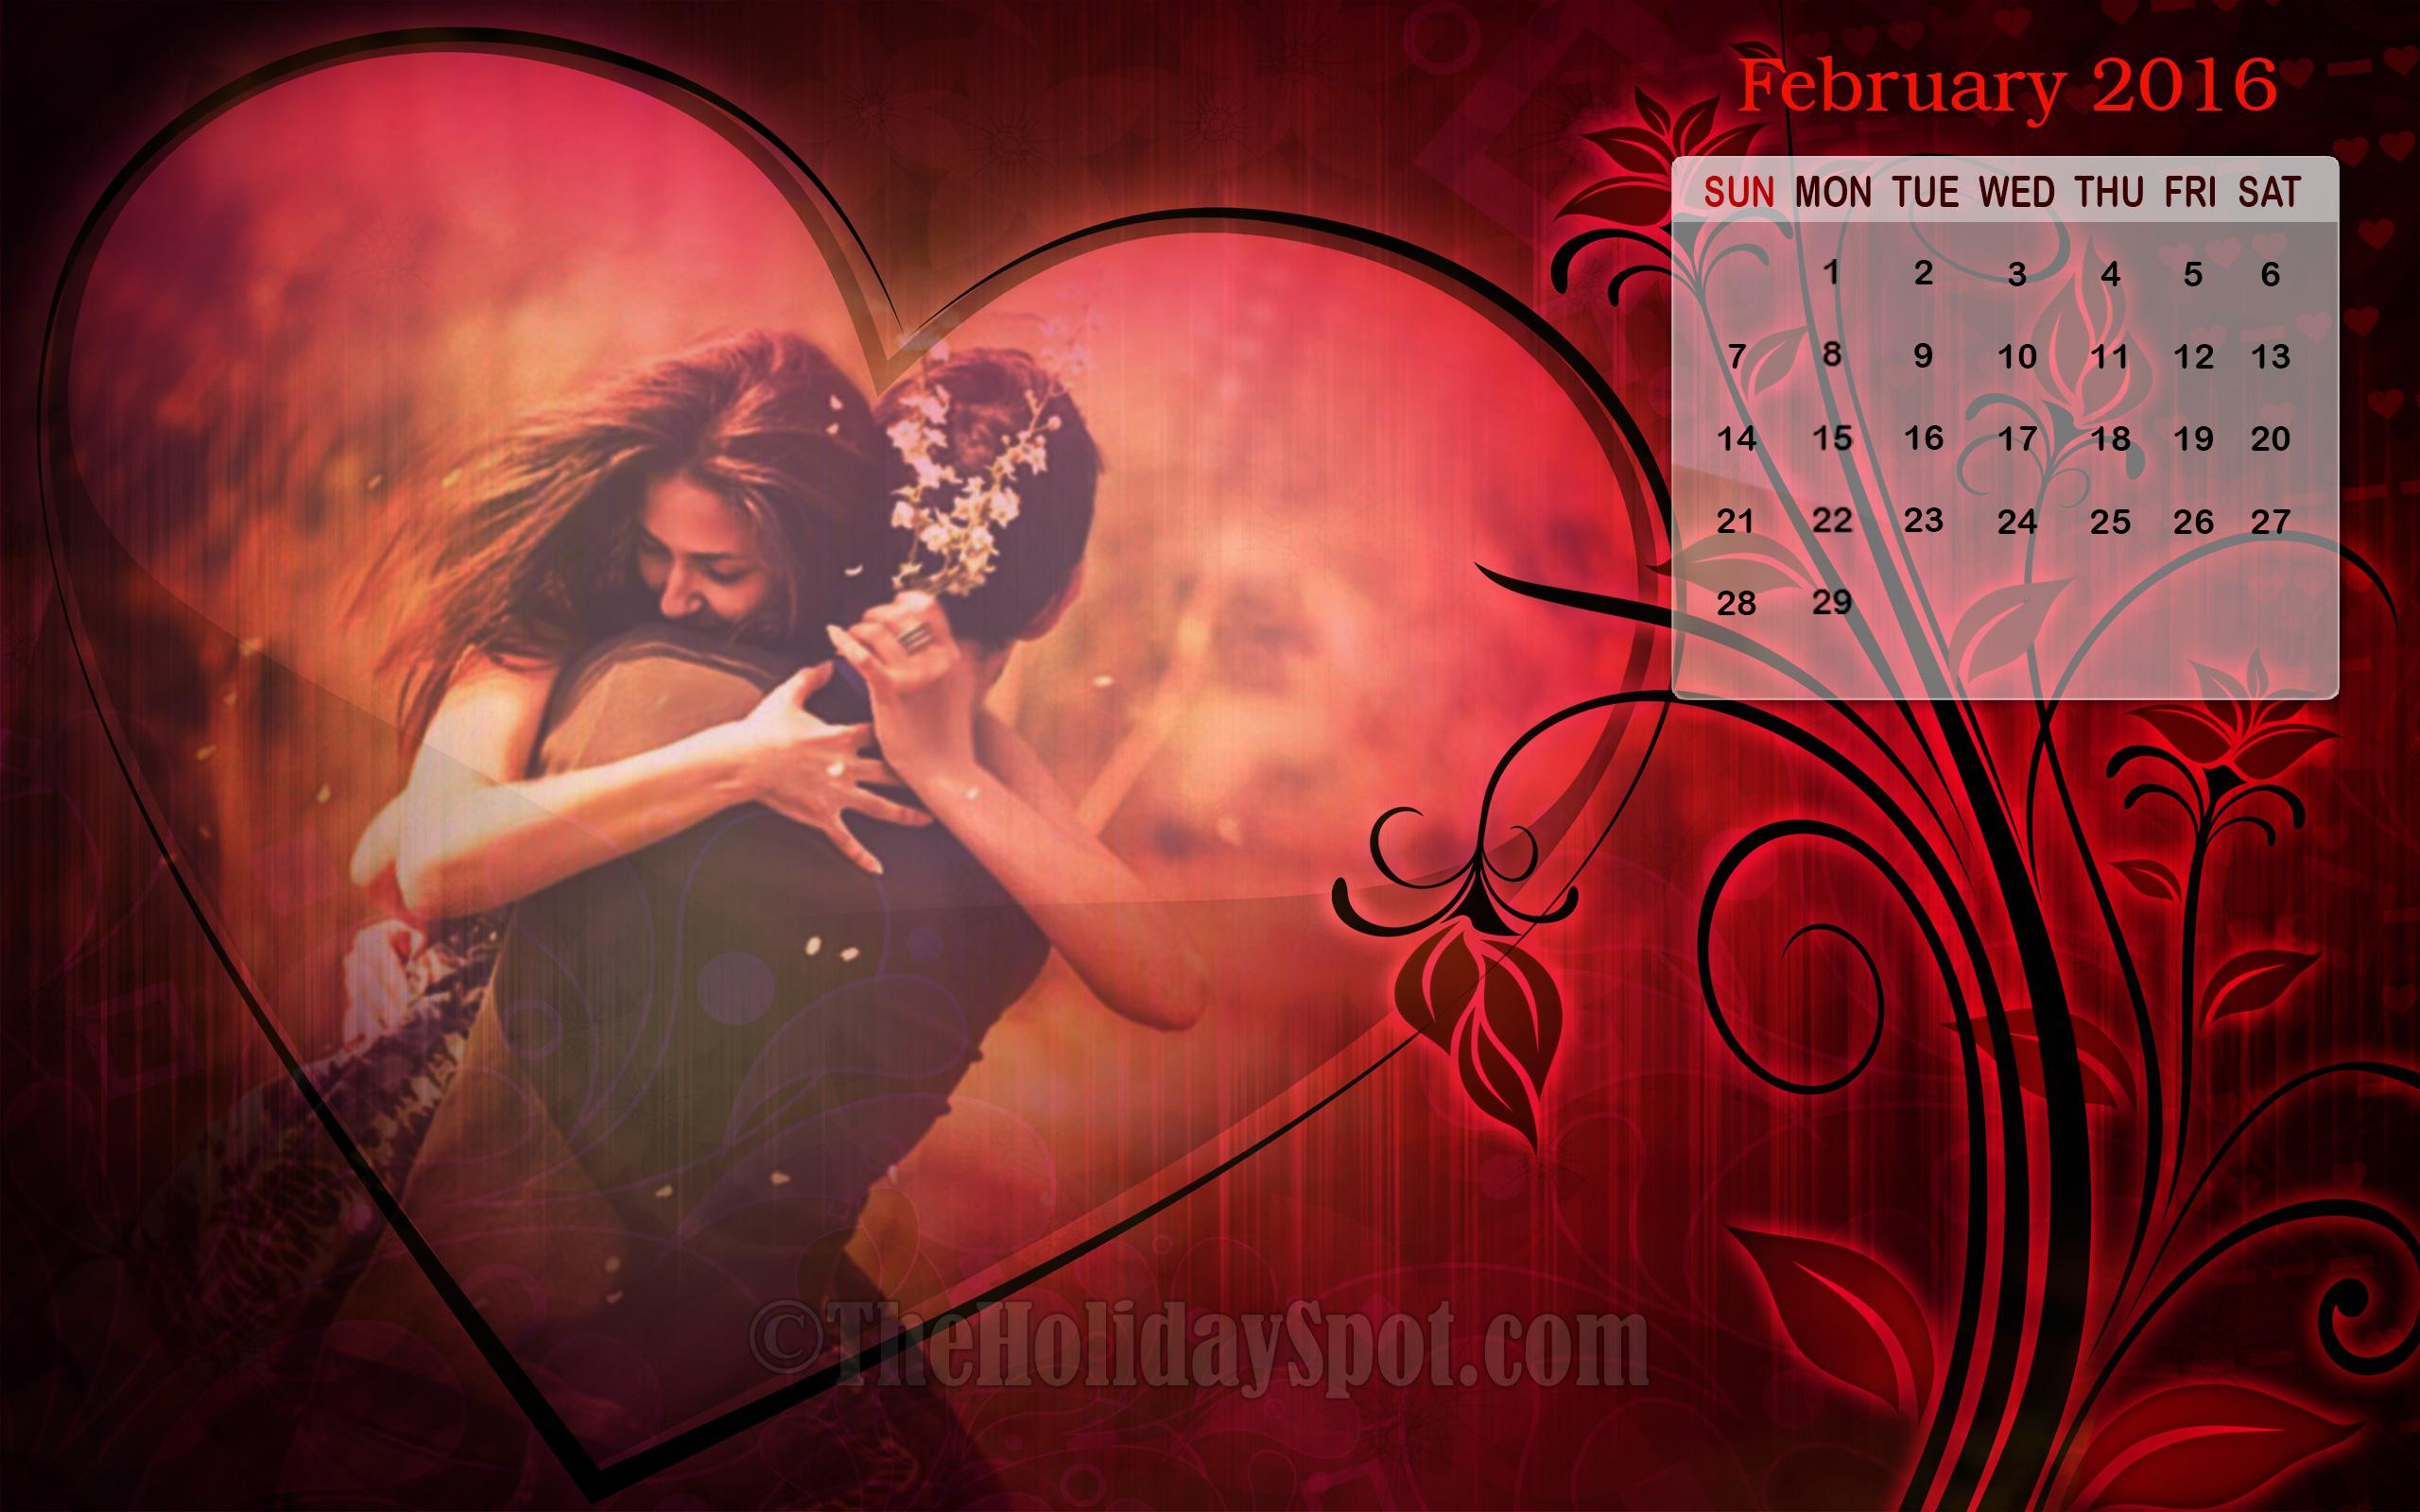 Love themed February Calendar Wallpaper 2016 2560x1600